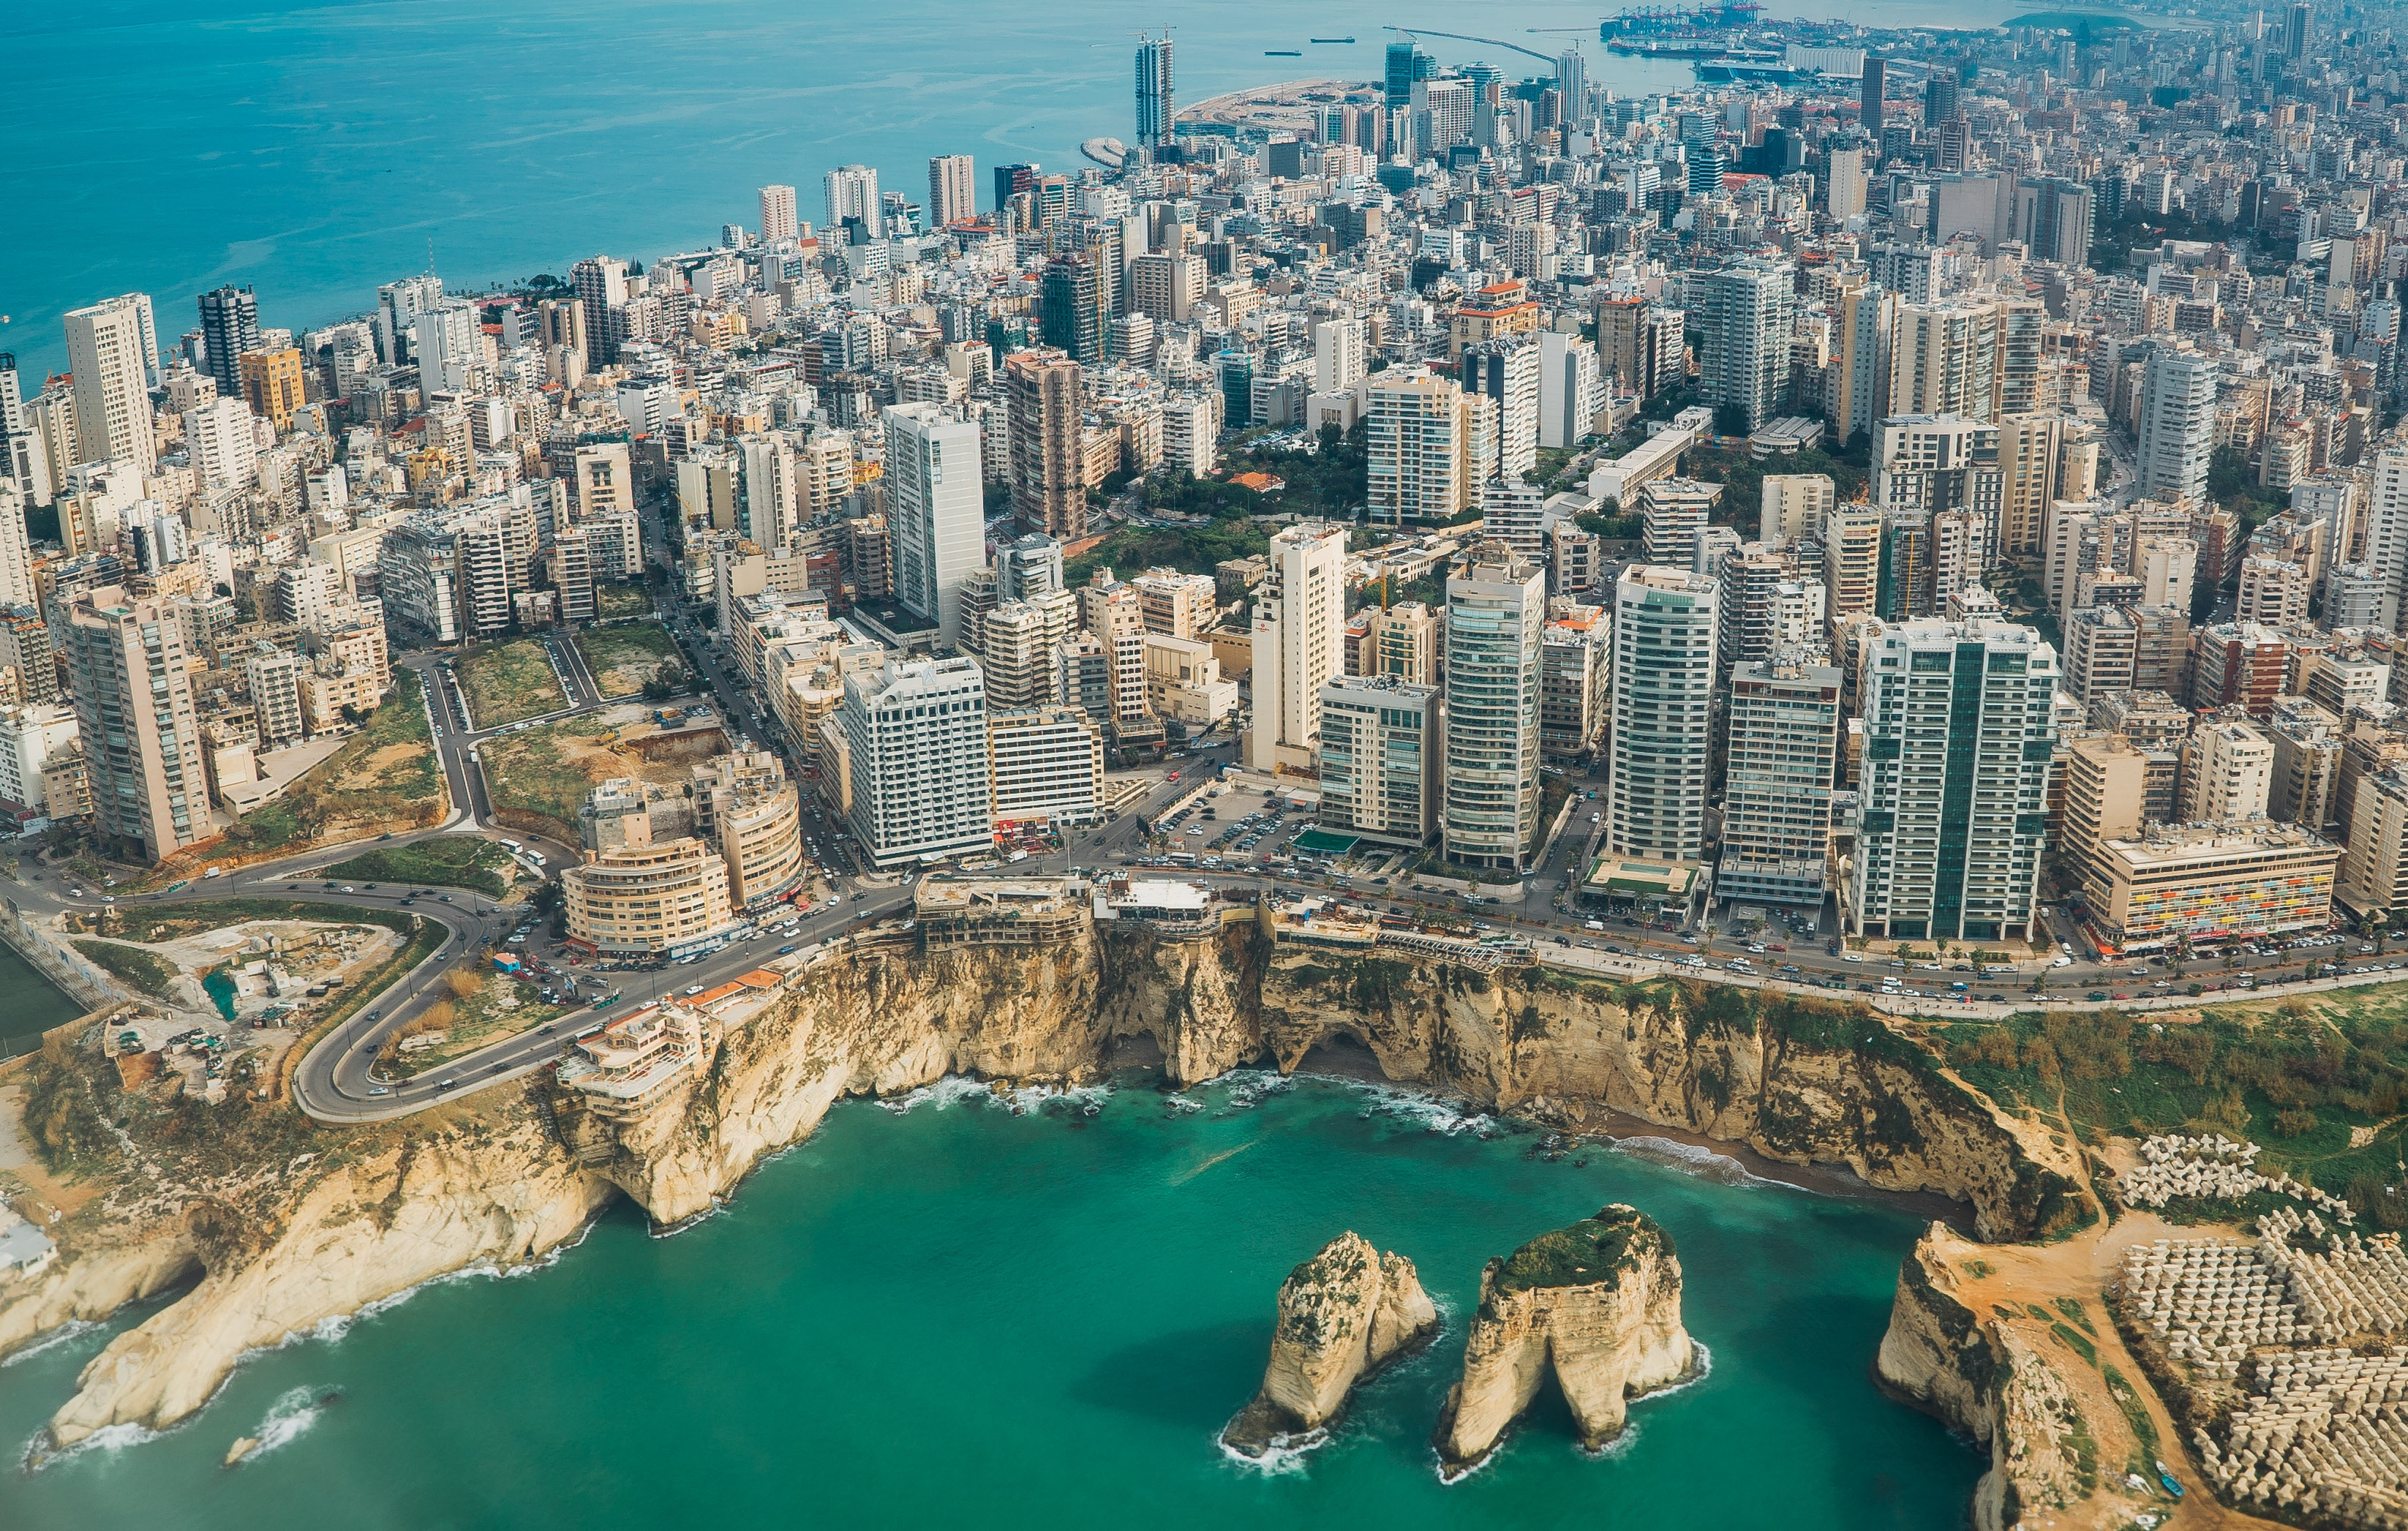 Arap Kulturu Hakkinda Bilinmesi Gereken 10 Gercek